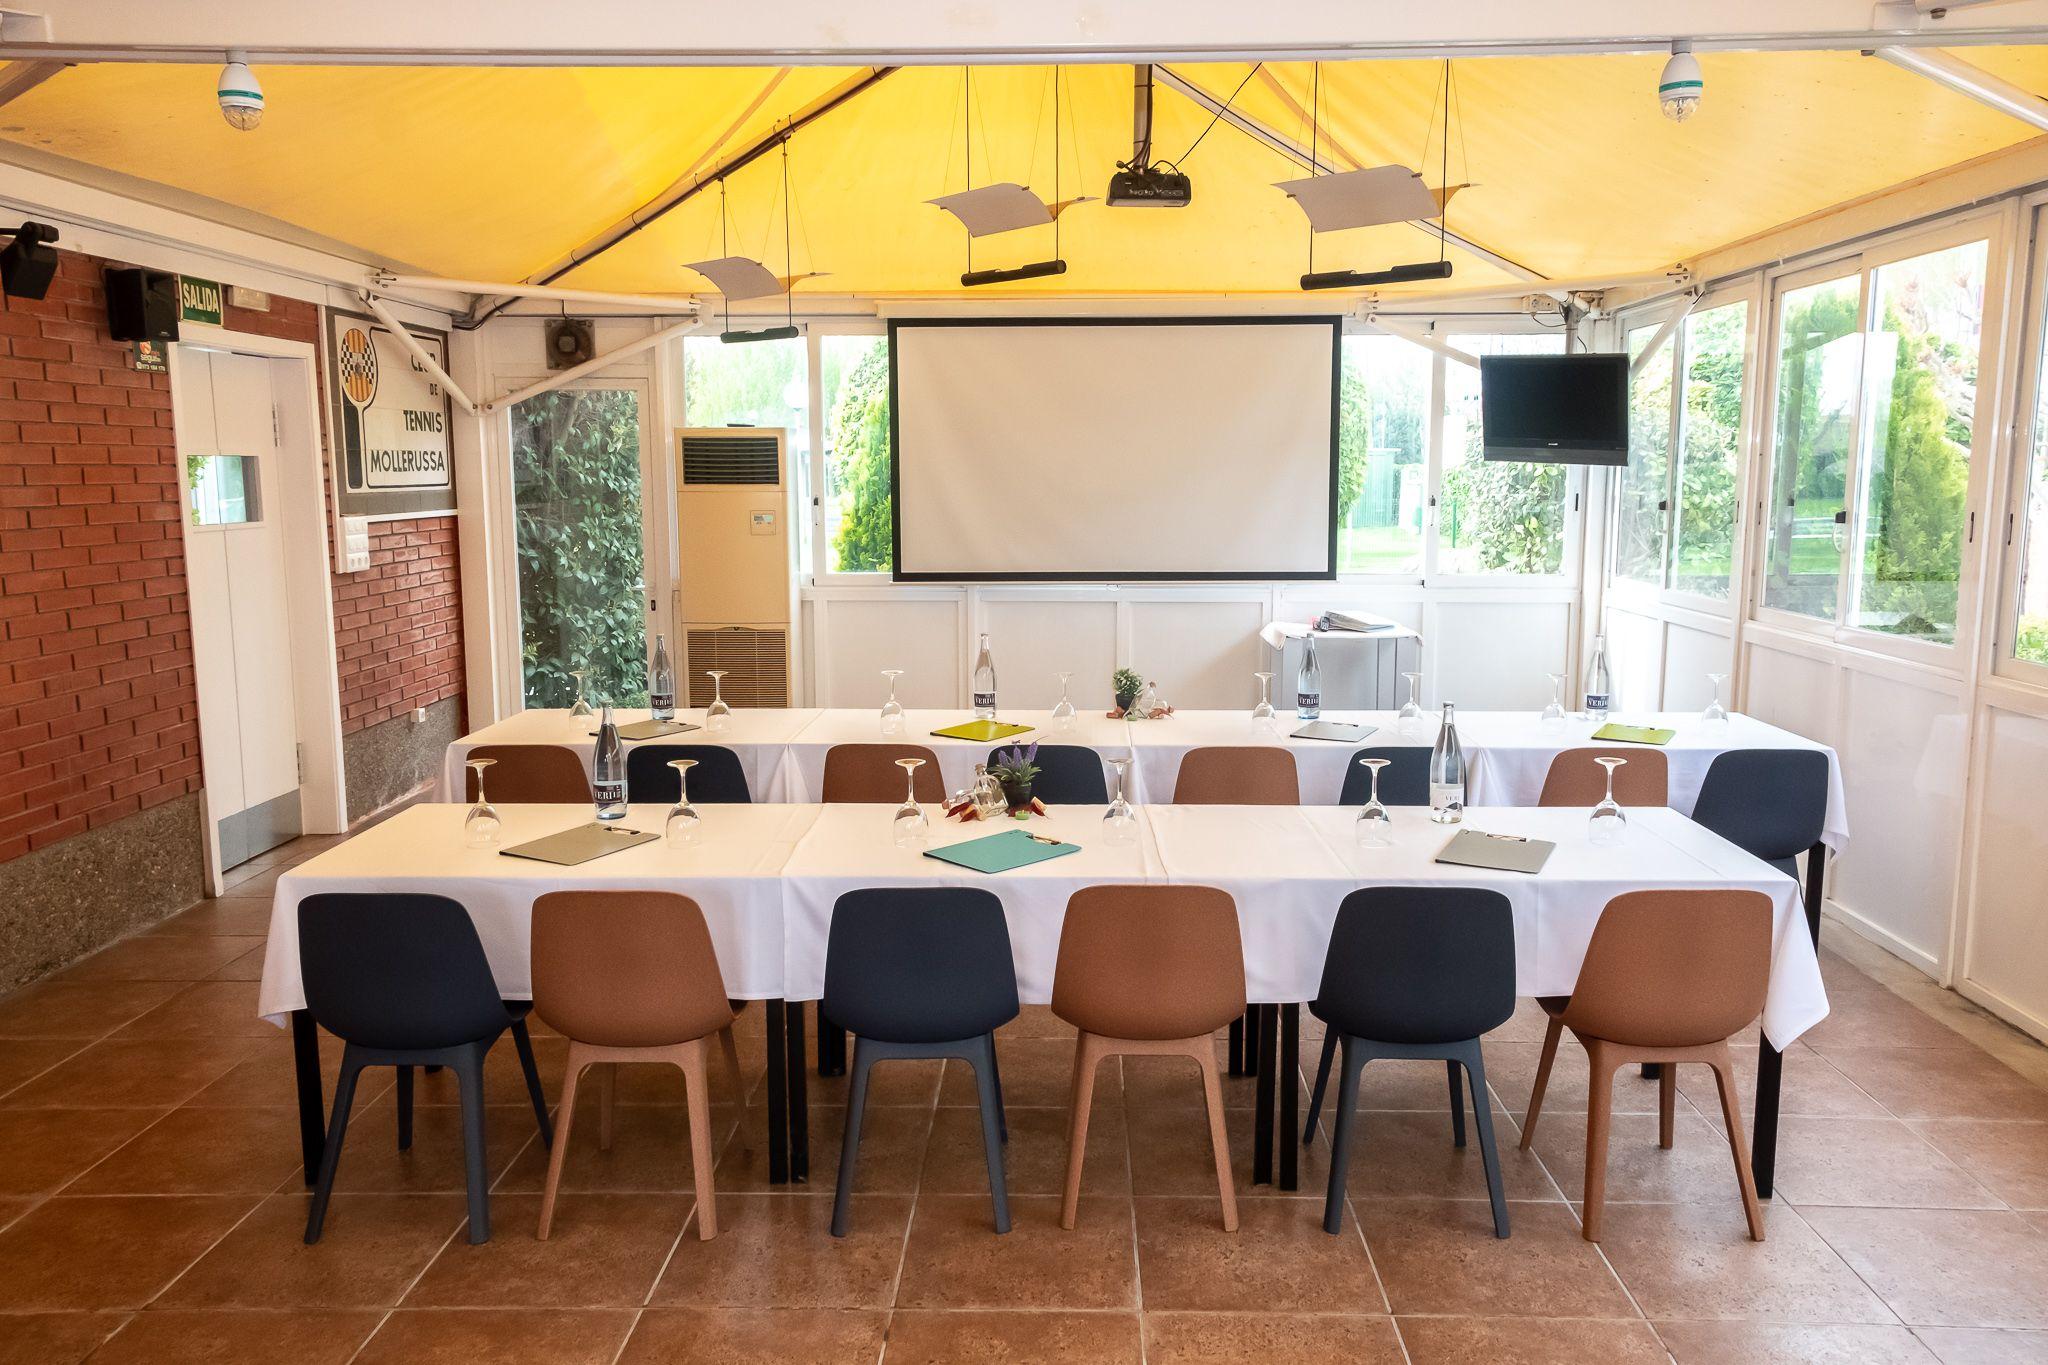 Restaurante comidas empresas Lleida